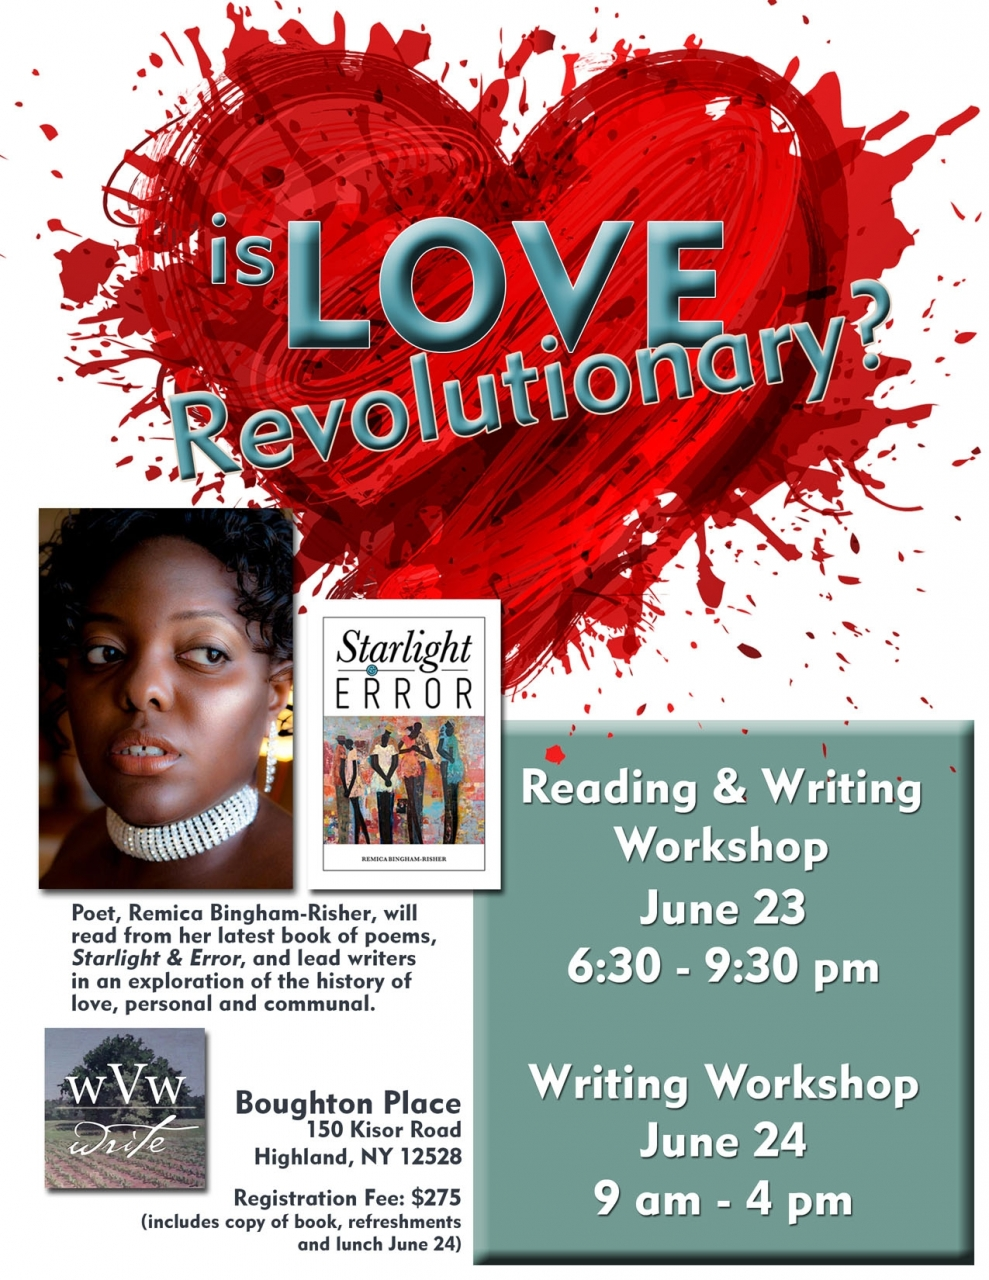 BinghamR_WEB - Reading and Writing Workshop_June 2017_Wallkill Valley Writers version 2.jpg